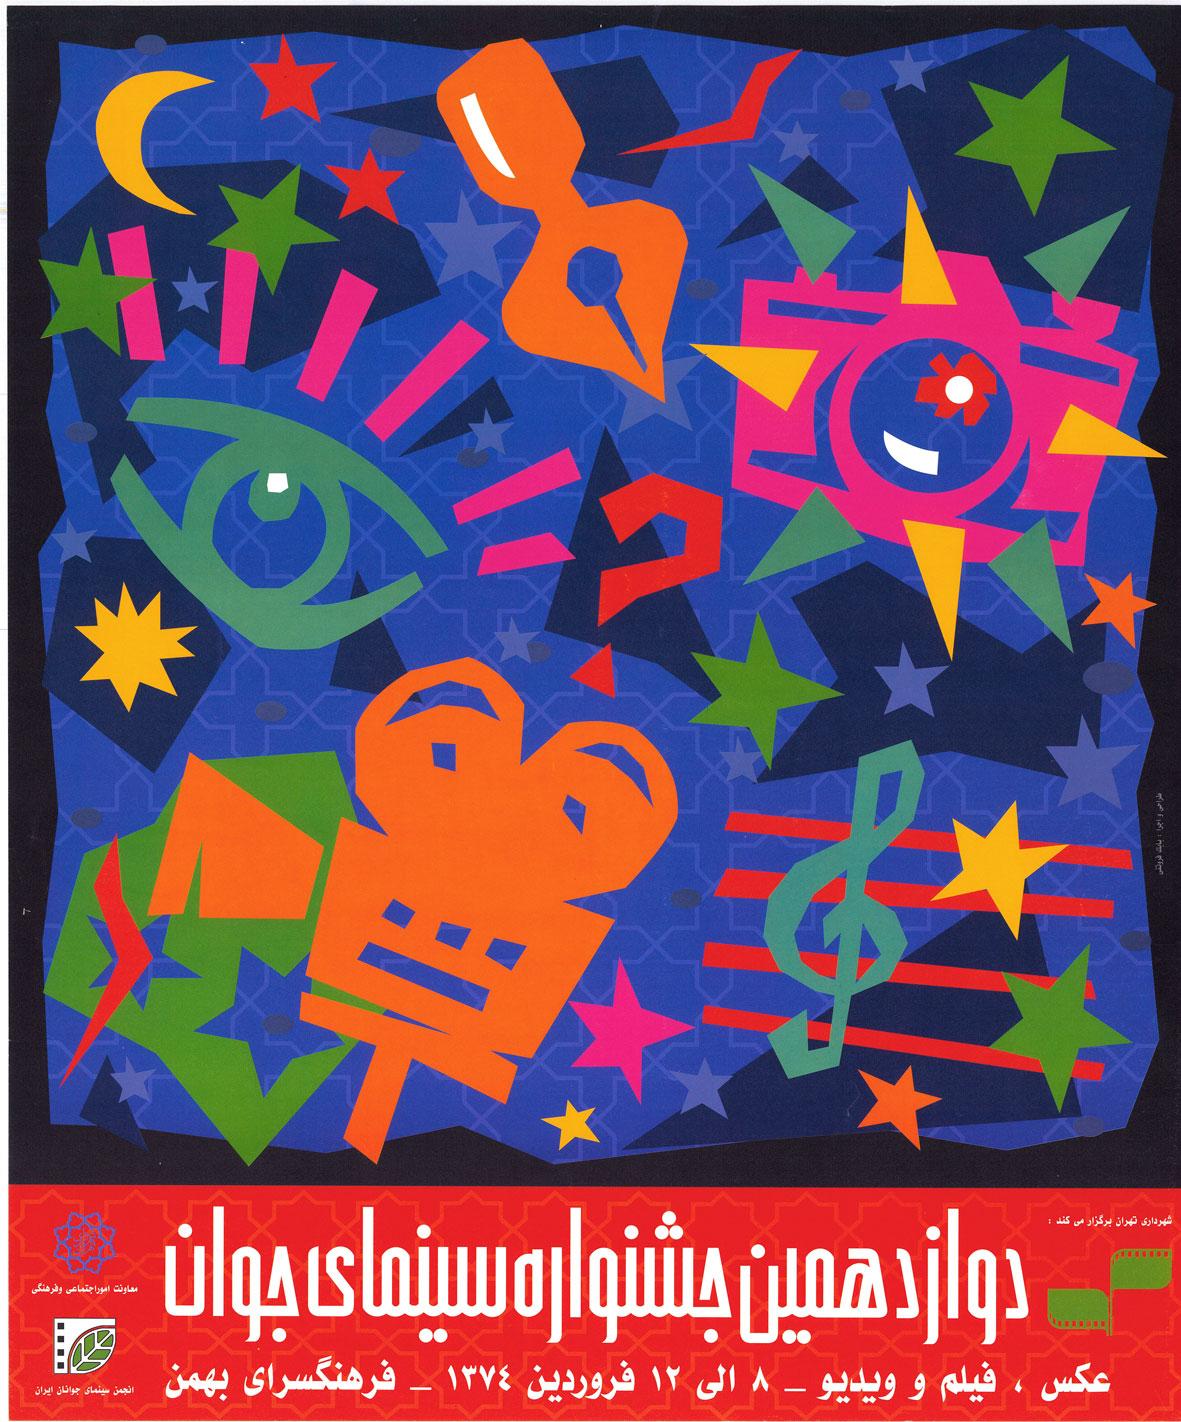 12th Festival 1995